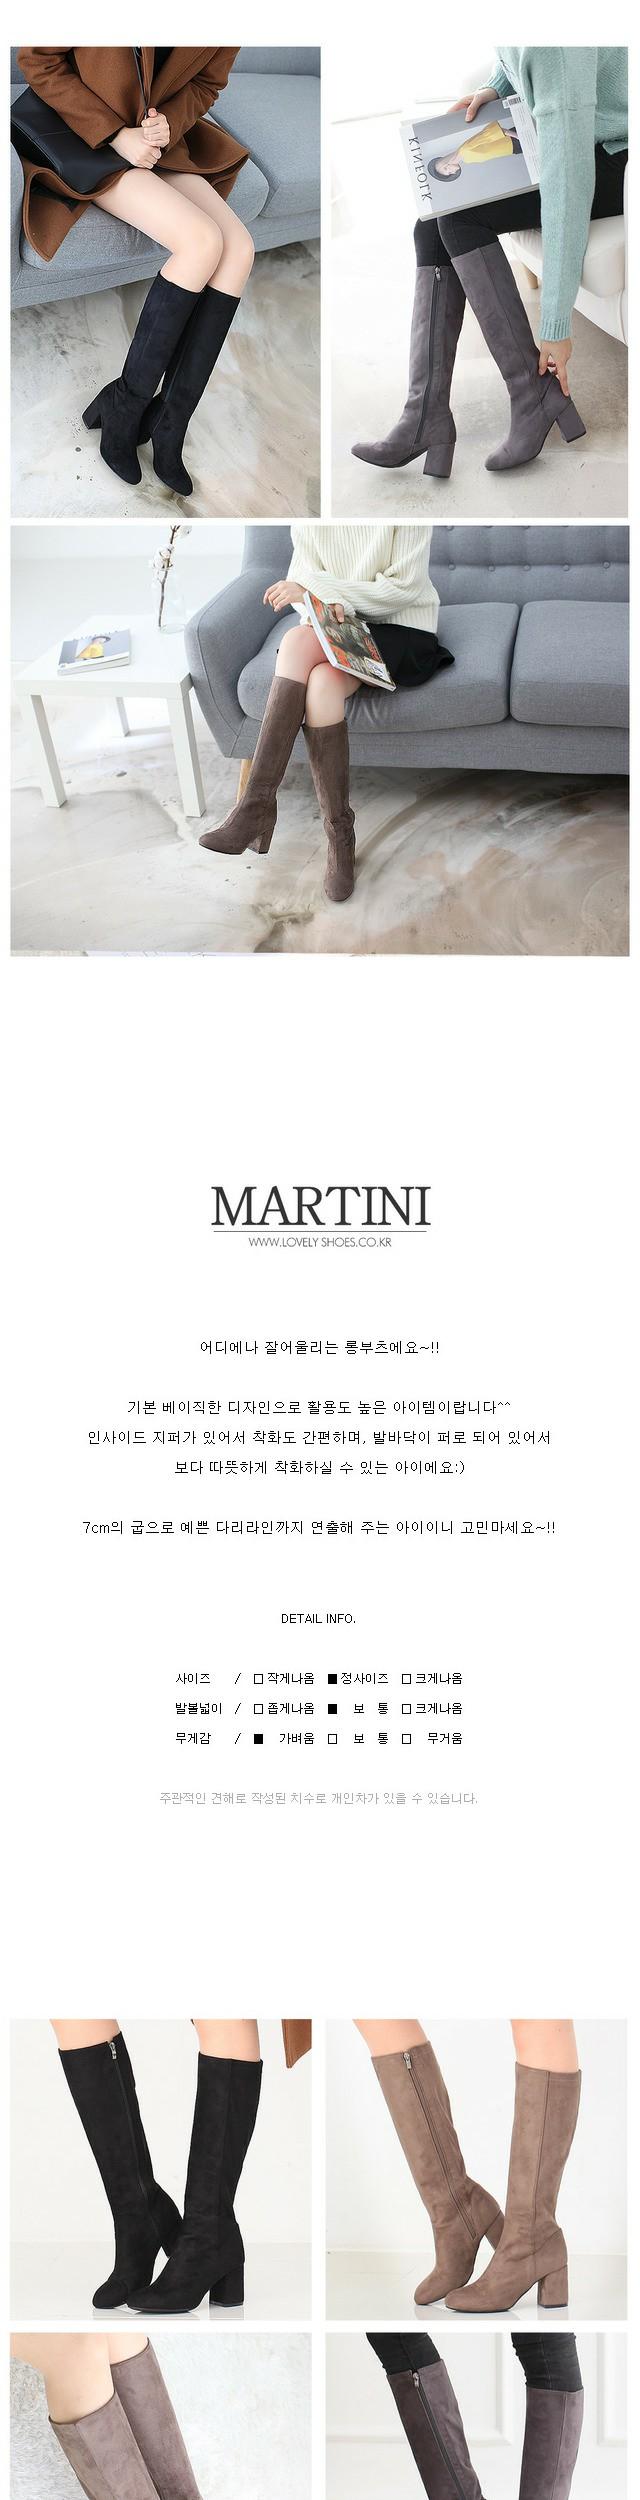 Martini Long boots 7cm